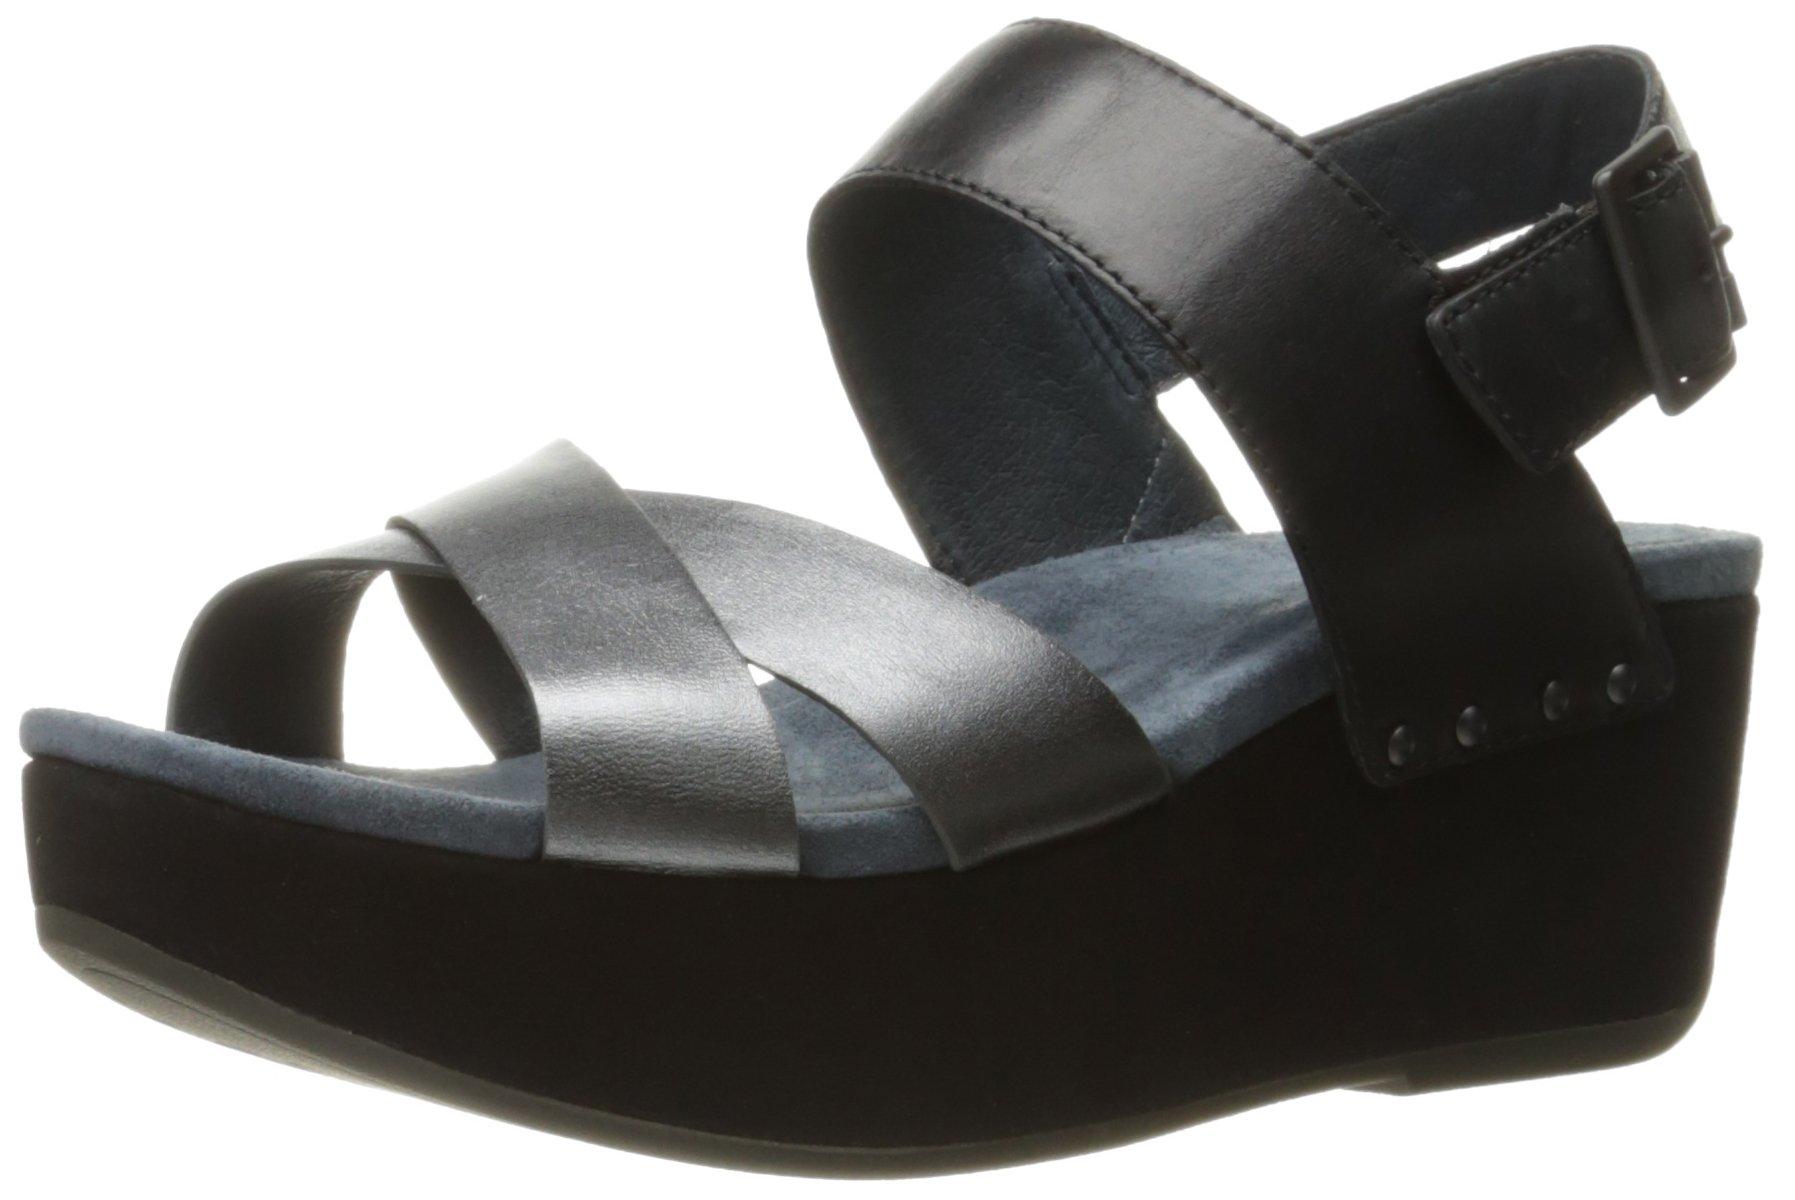 Dansko Women's Stasia Platform Sandal, Black/Pewter Burnished, 40 EU/9.5-10 M US